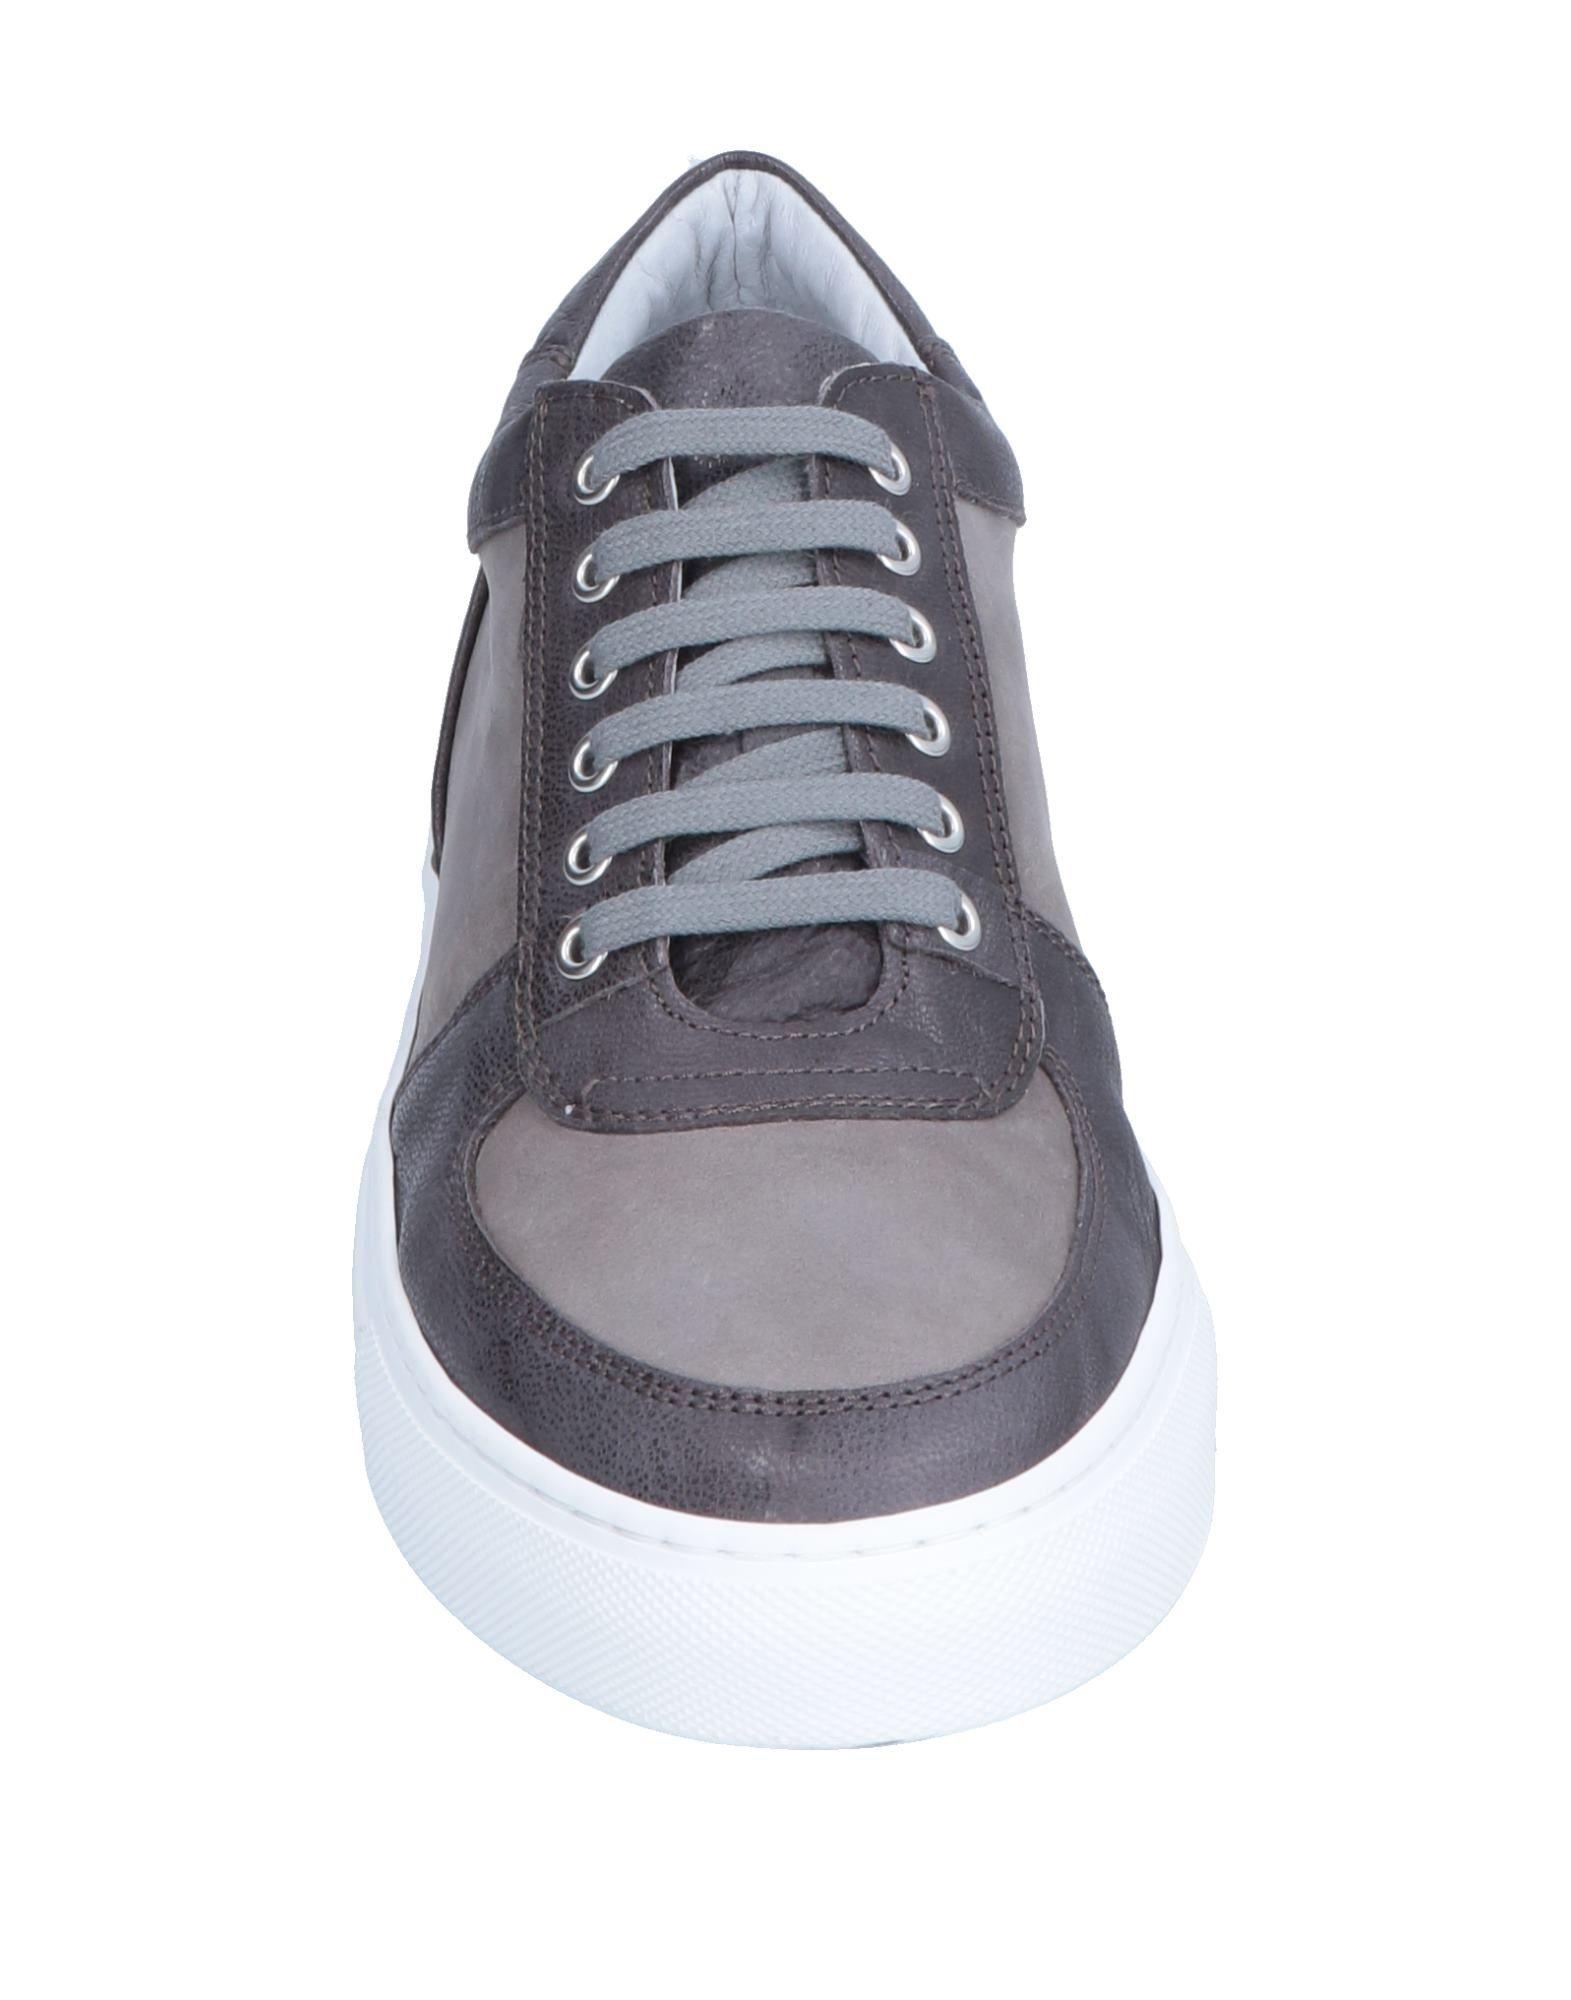 Fabiano Ricci Gute Sneakers Herren  11547036XC Gute Ricci Qualität beliebte Schuhe 63e4c9